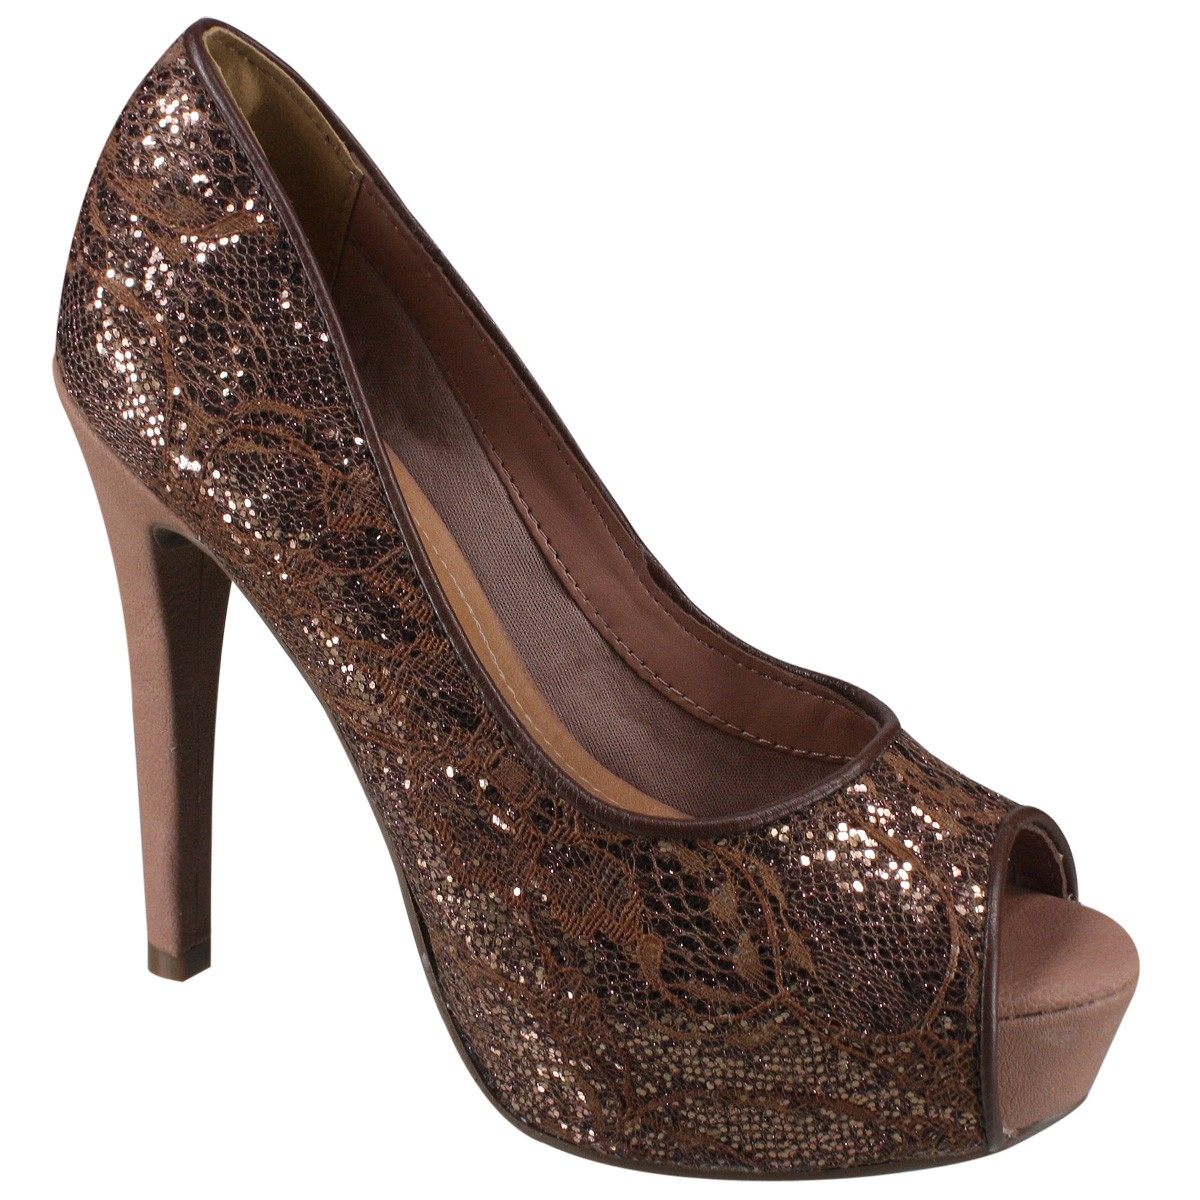 b37043028 Sapato Peep Toe Via Marte 16-1304 - Bronze/Antique (Renda Lux/Nobuck ...